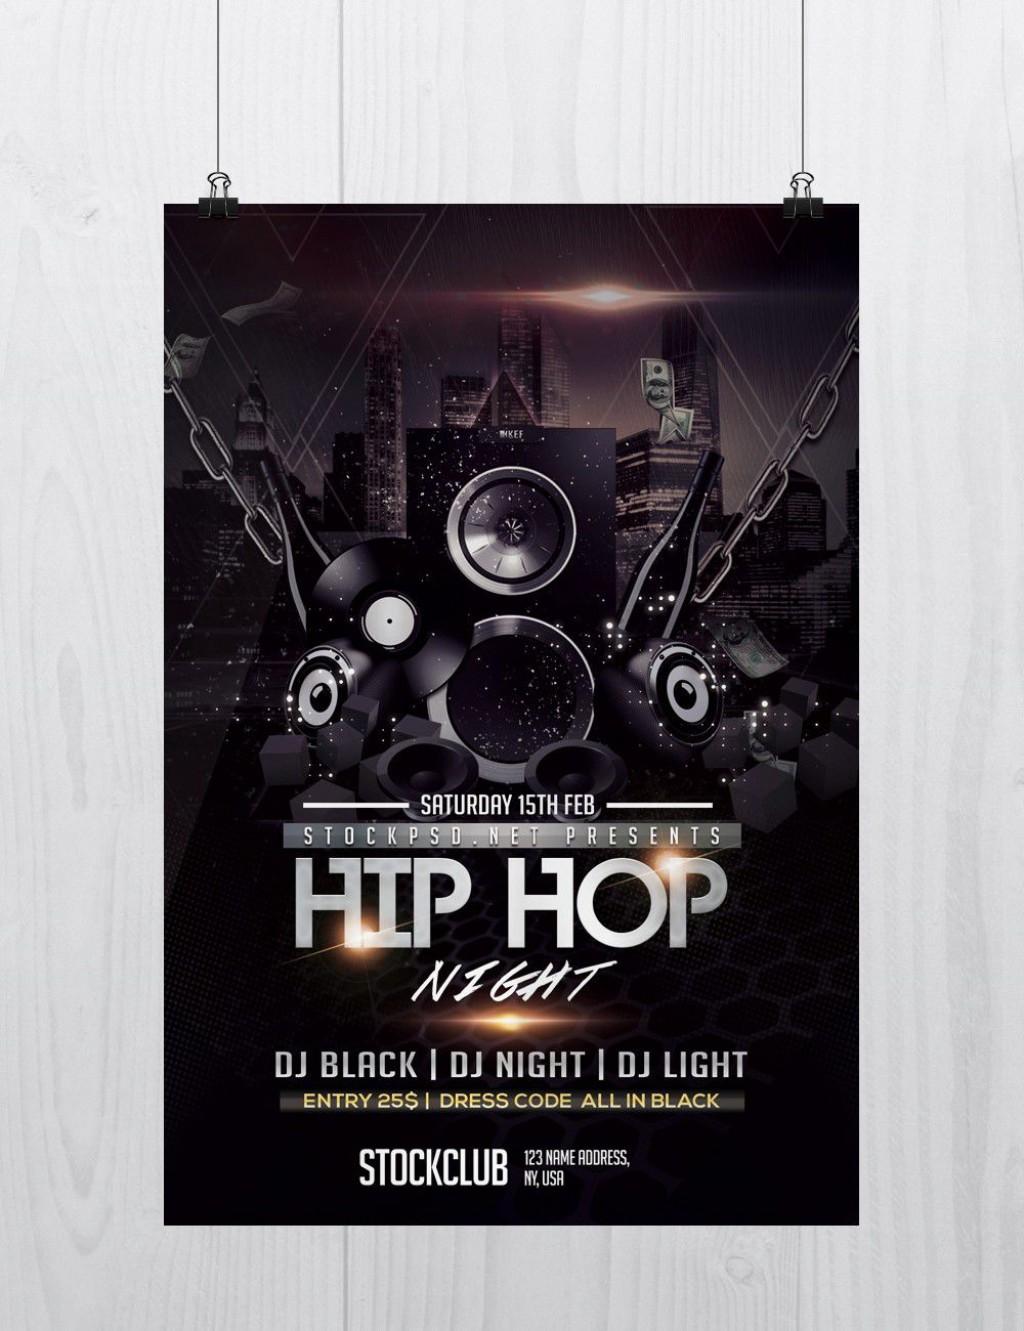 007 Magnificent Hip Hop Flyer Template Design  Templates Hip-hop Party Free DownloadLarge